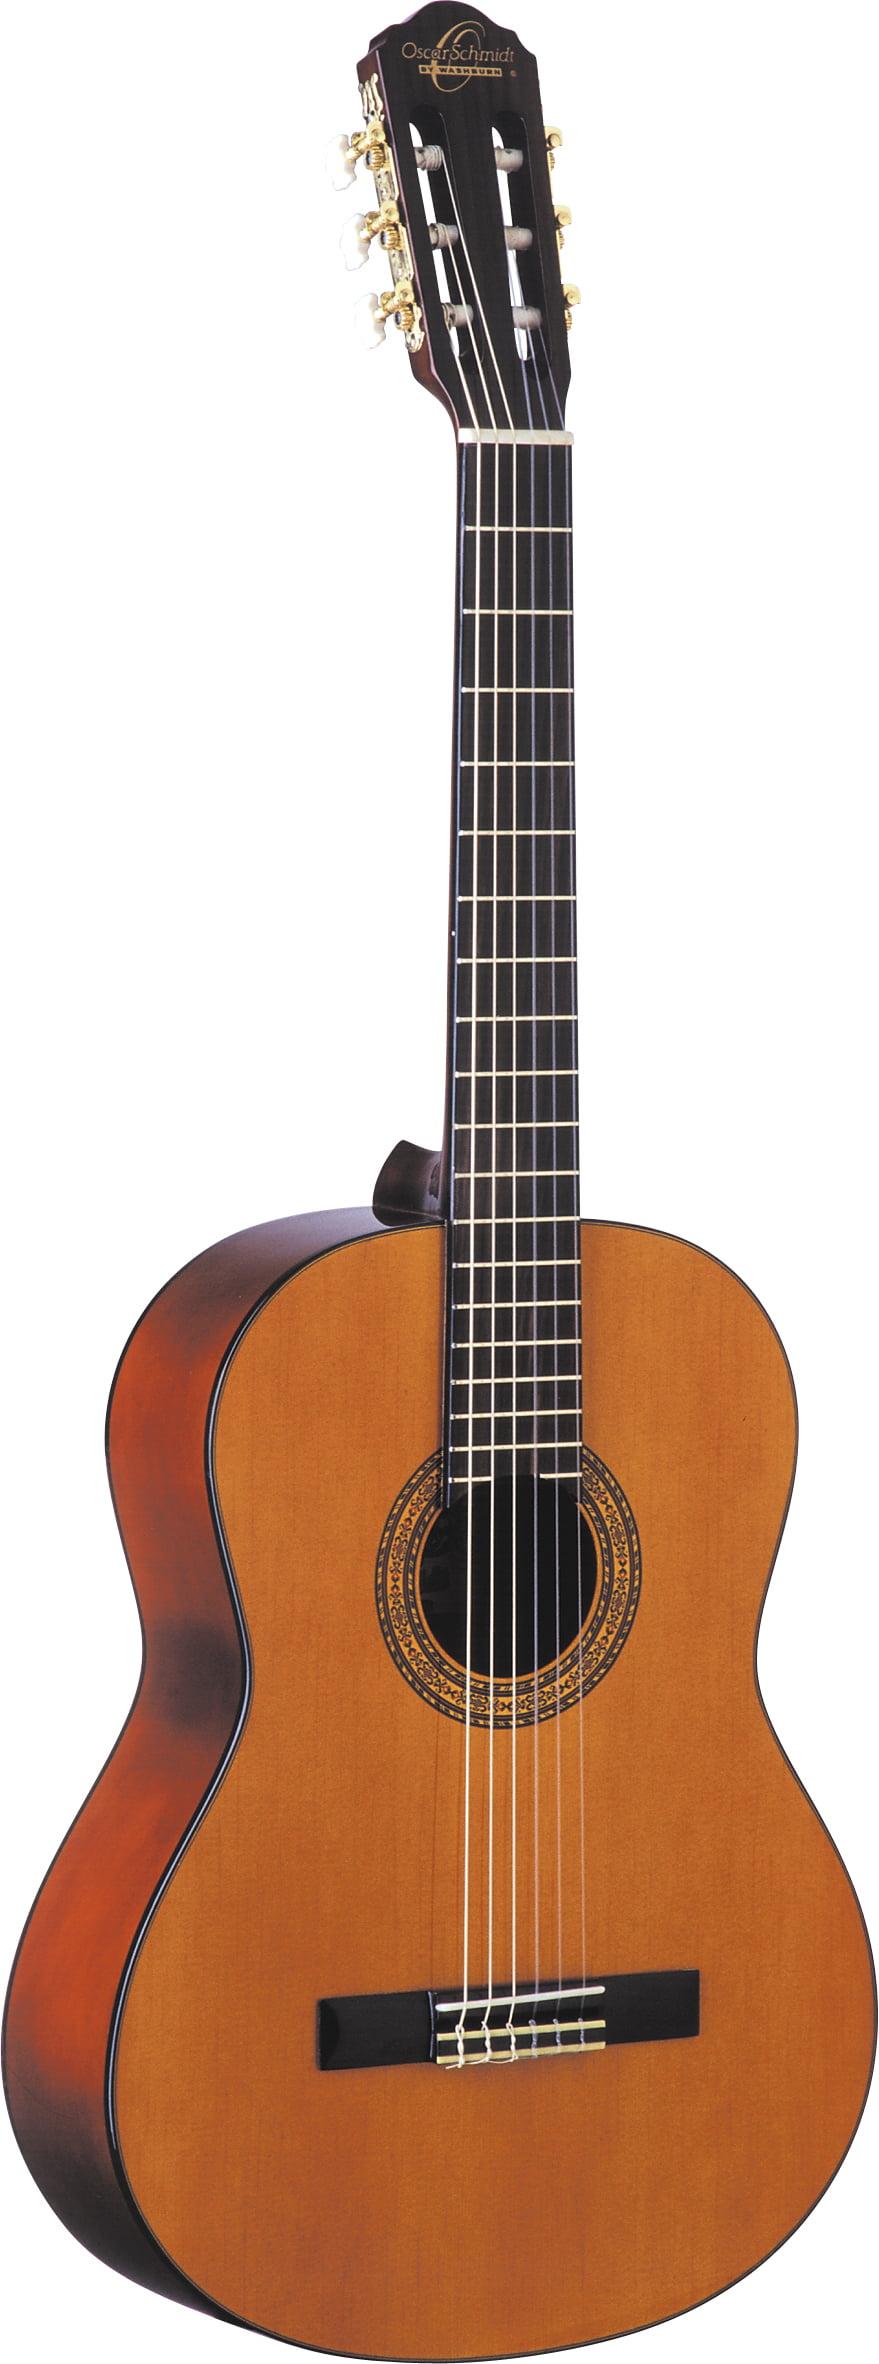 Oscar Schmidt OC1 3 4 Size Classical Guitar. Natural Satin by KMC Music